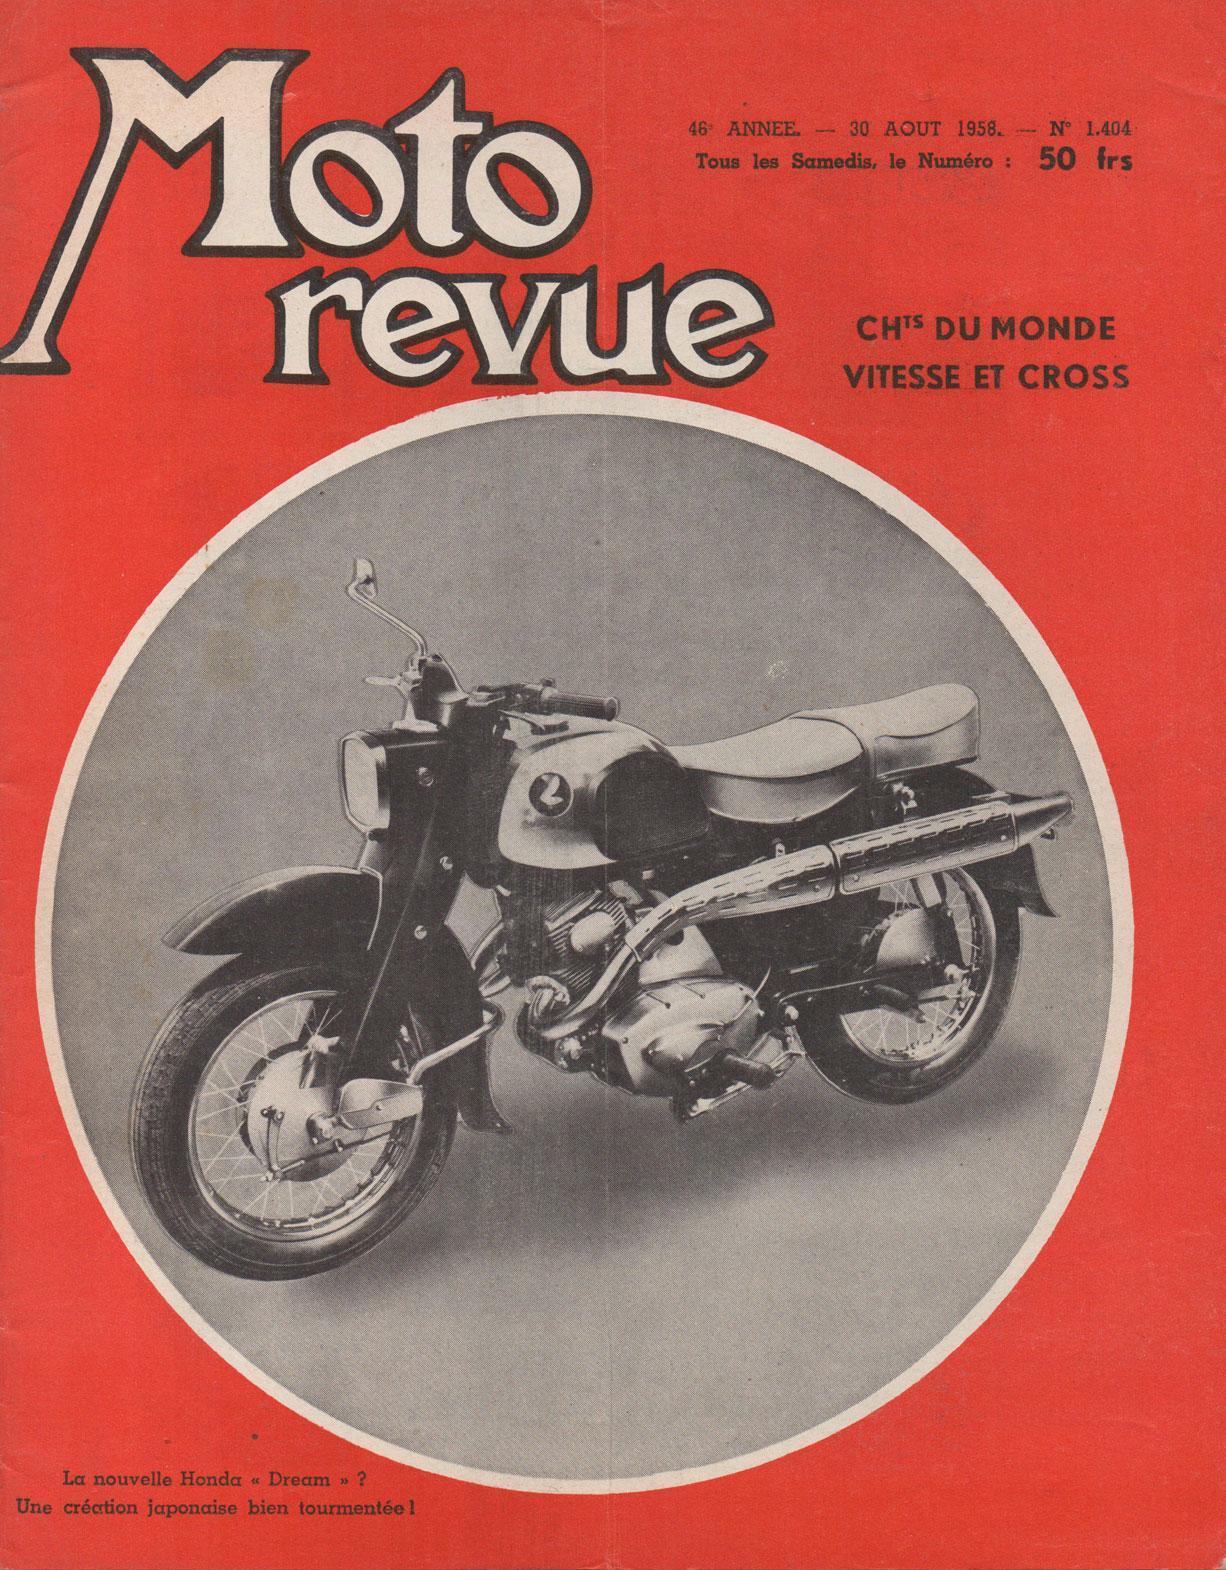 Moto Revue - 20 Aout 1958 - No. 1404